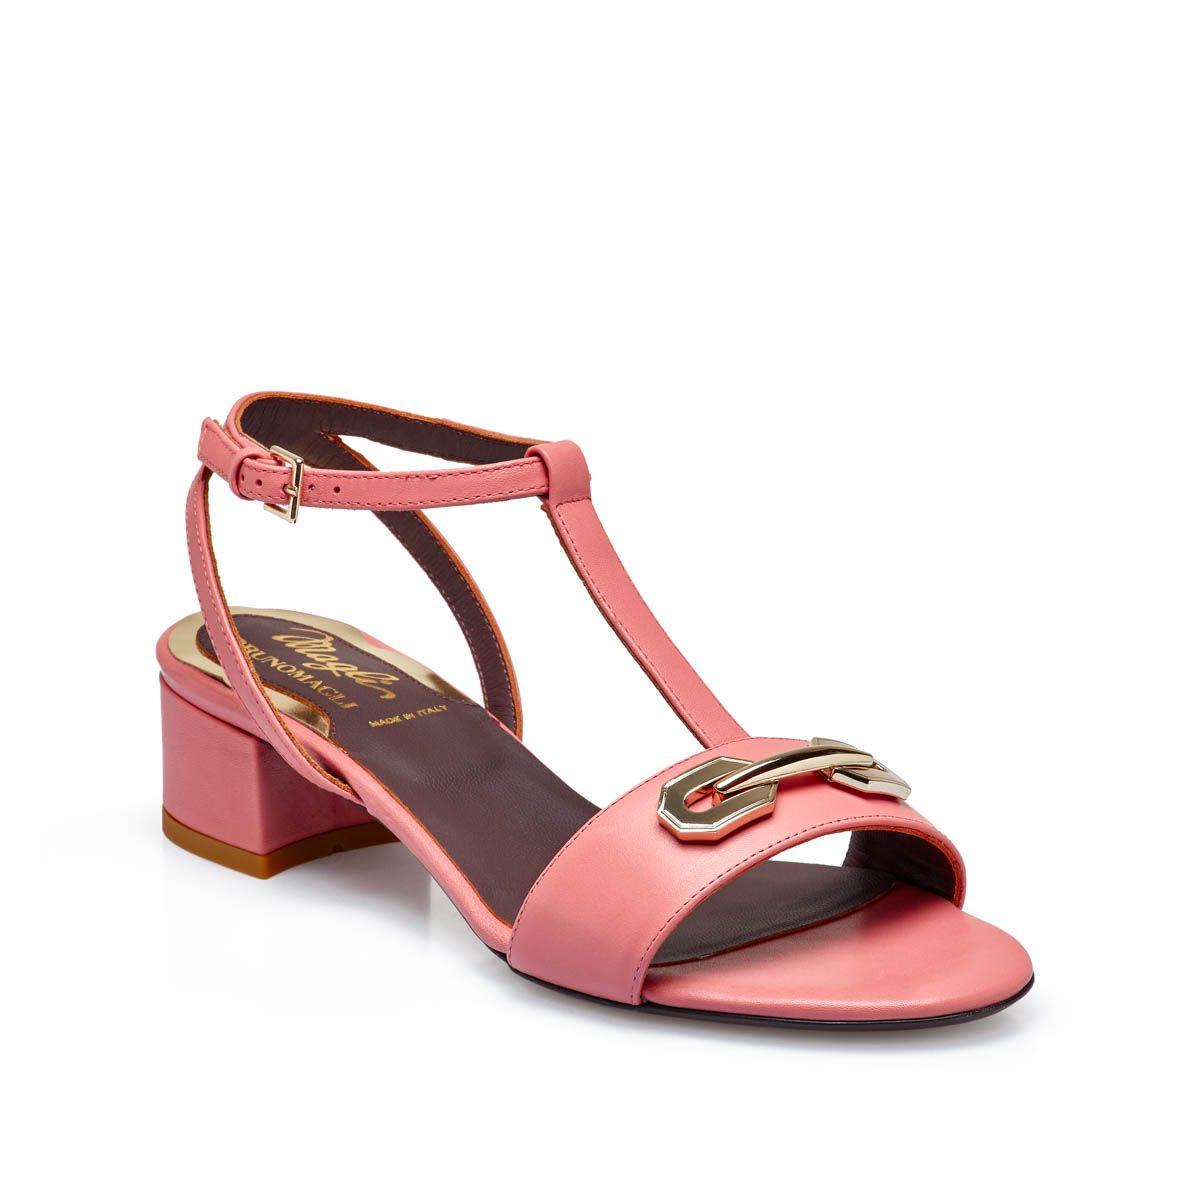 960706d05d9 Ursula Block Heel Sandal